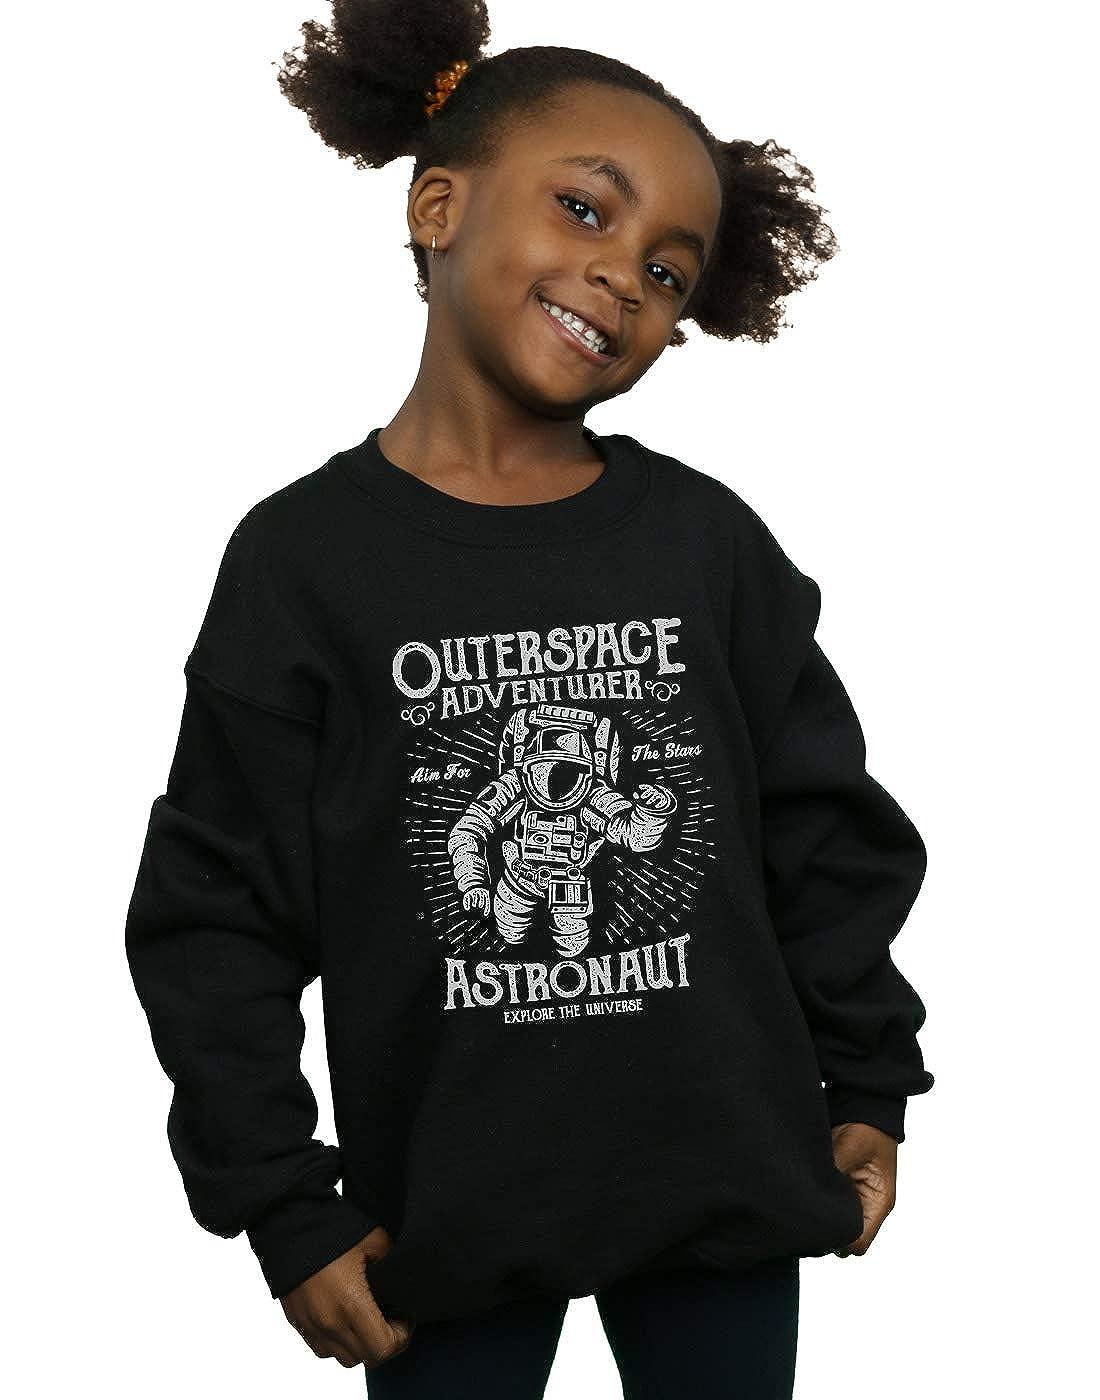 Absolute Cult Drewbacca Girls Astronaut Adventurer Sweatshirt